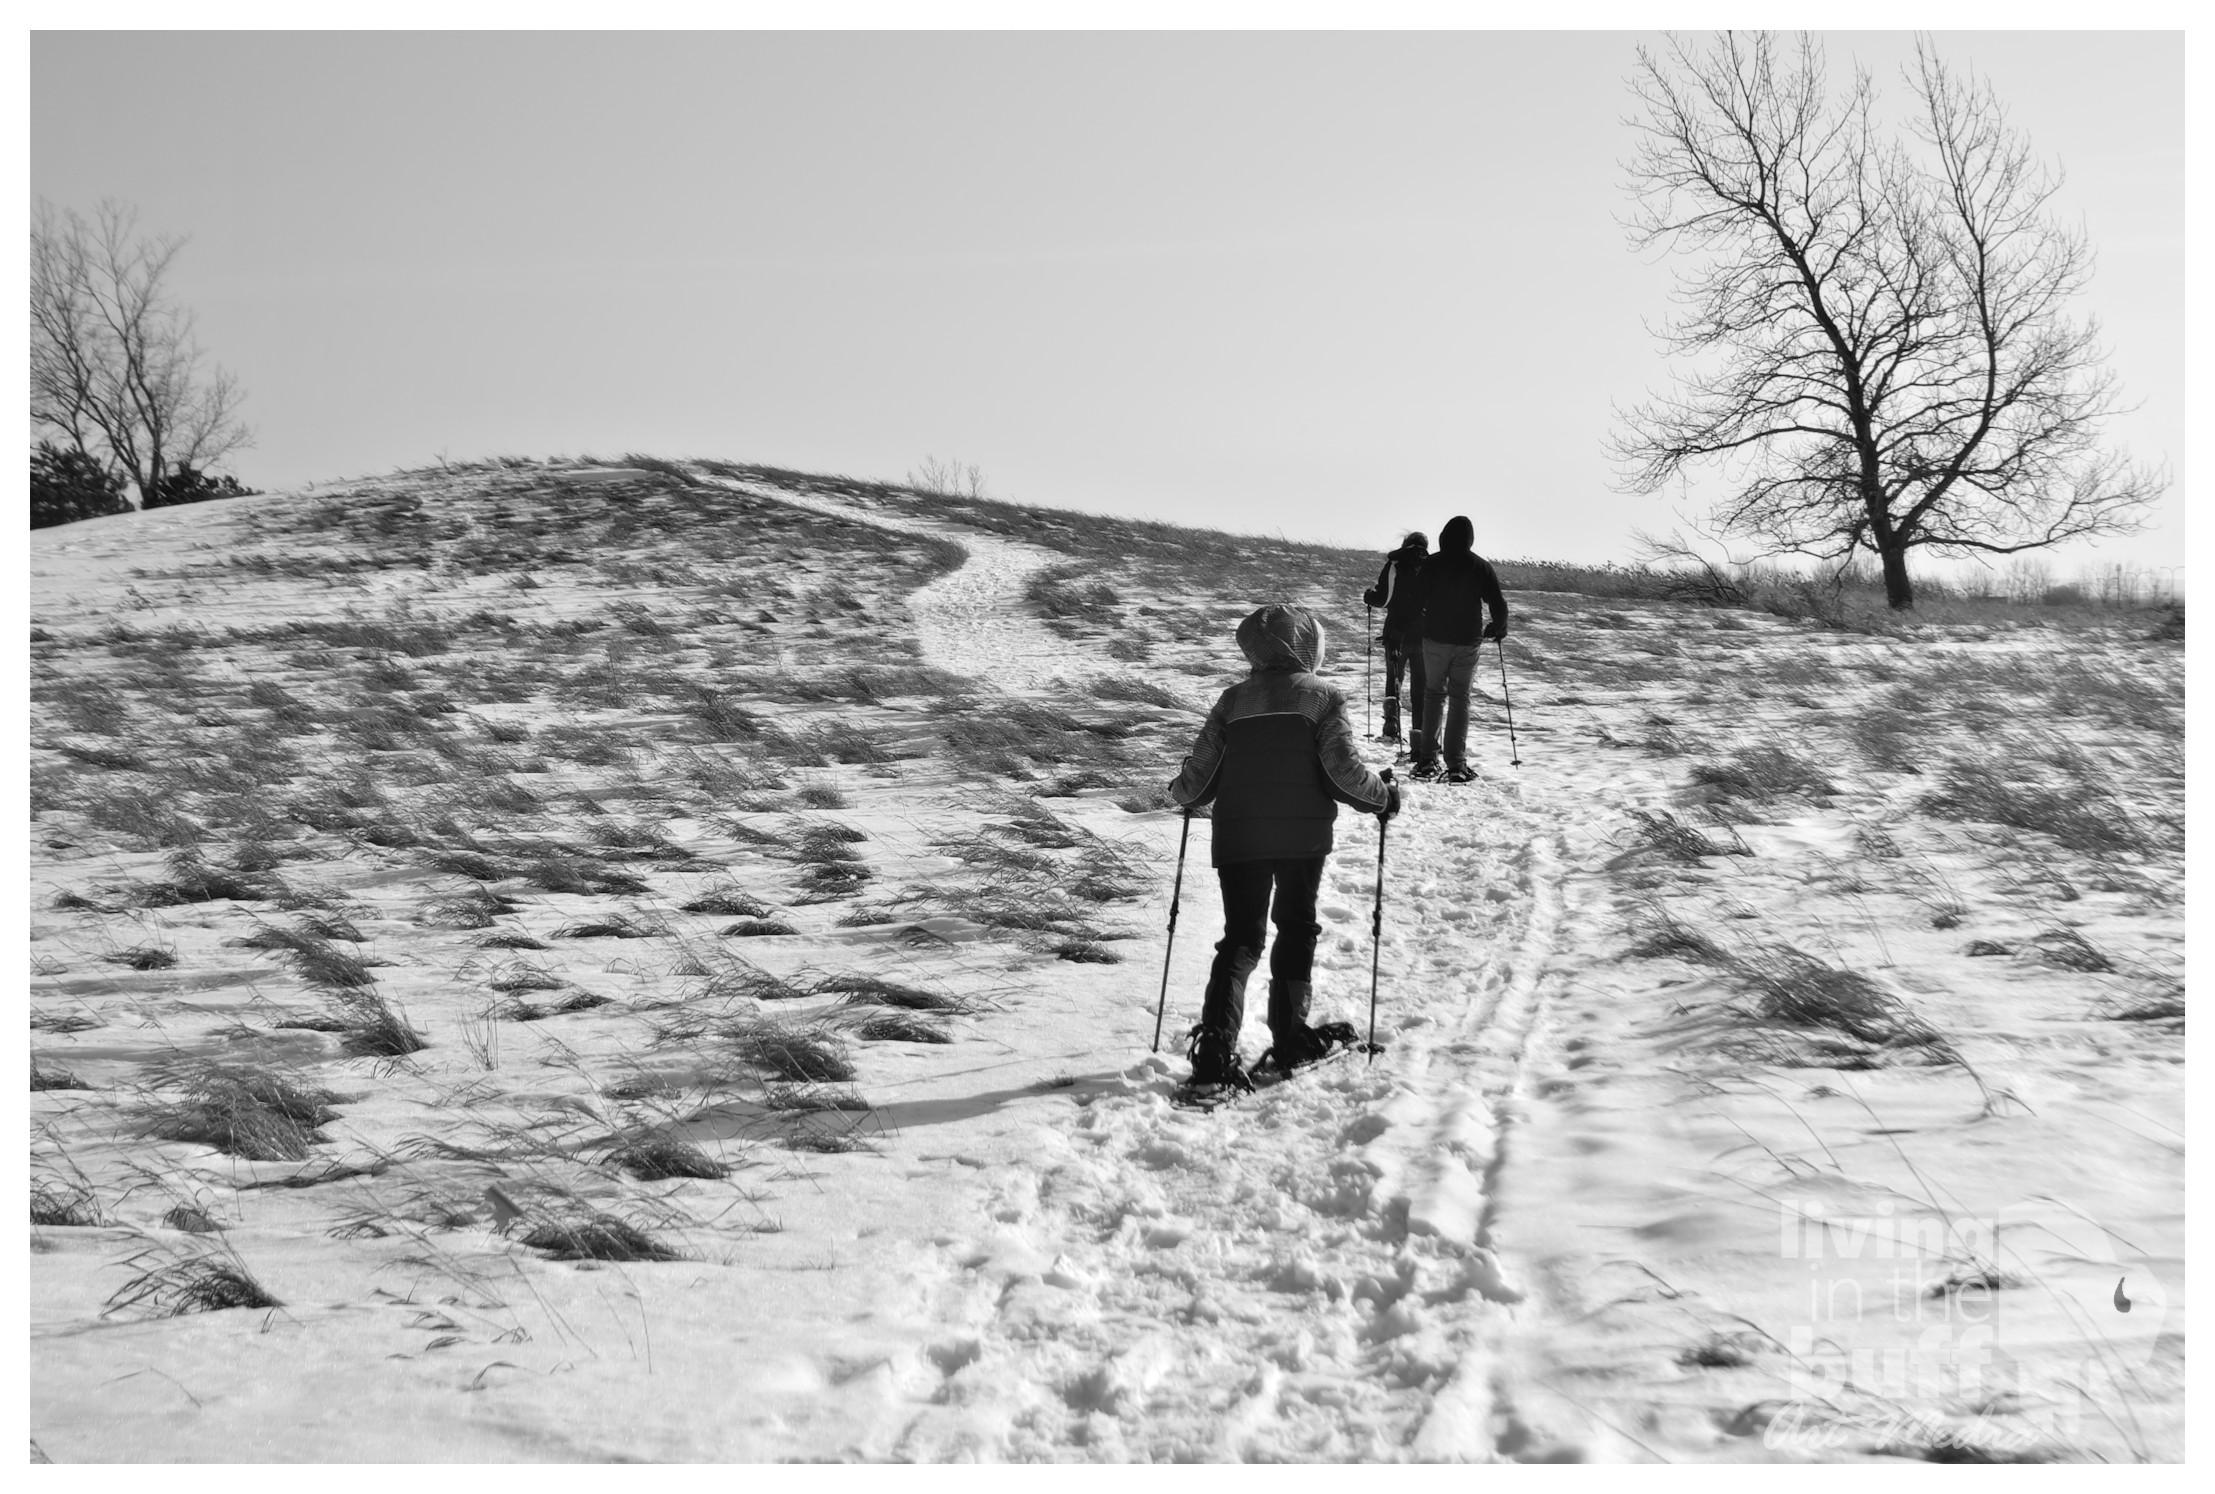 Snowshoeing at Tifft Nature Preserve